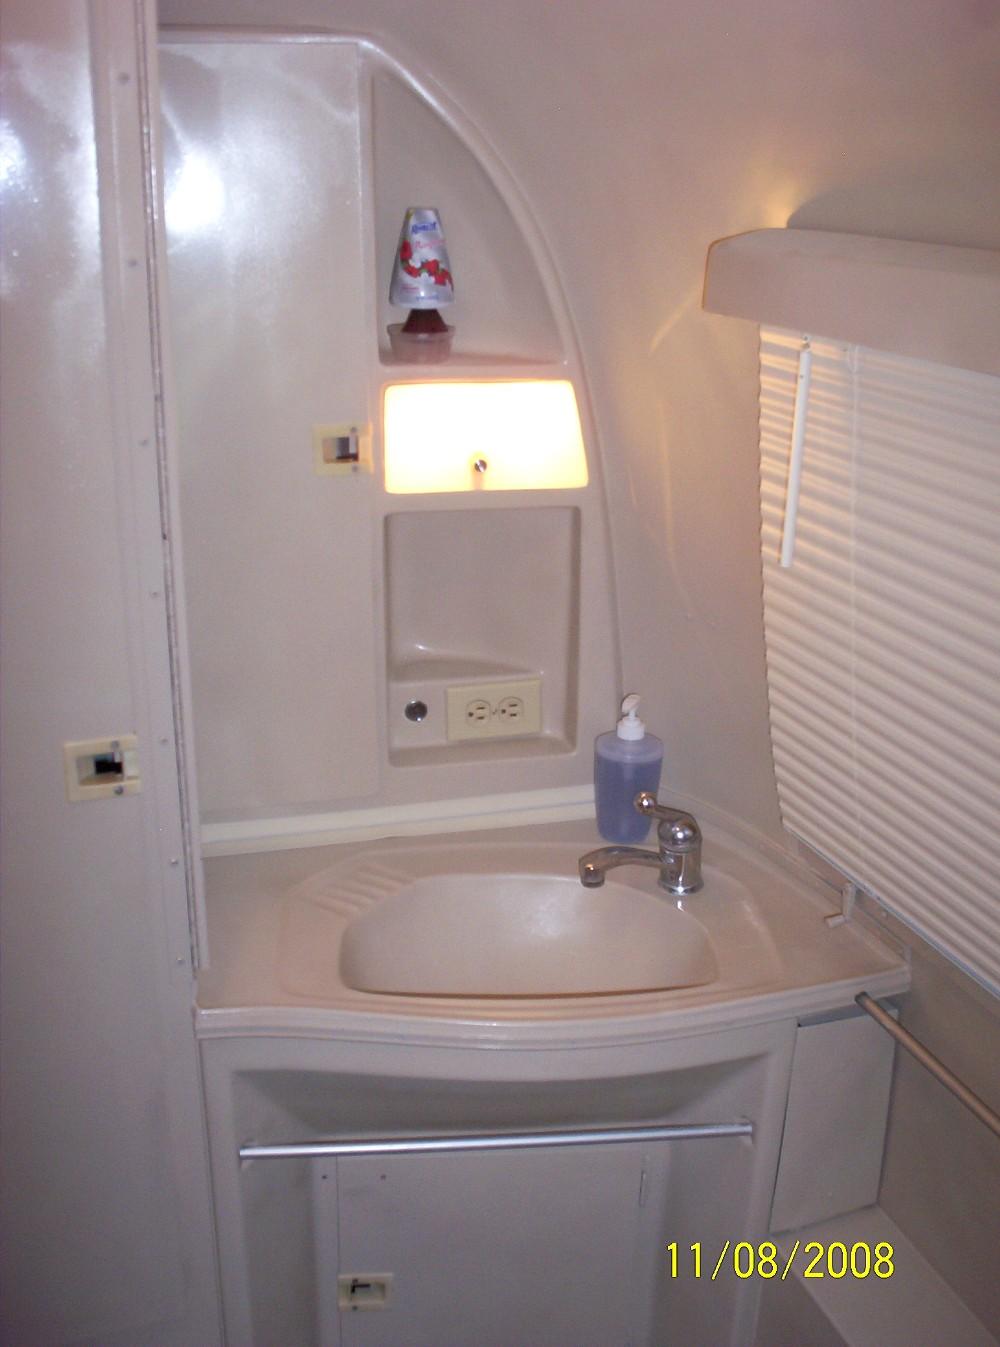 Click image for larger version  Name:Bella Bathroom 1.JPG Views:143 Size:210.1 KB ID:73401